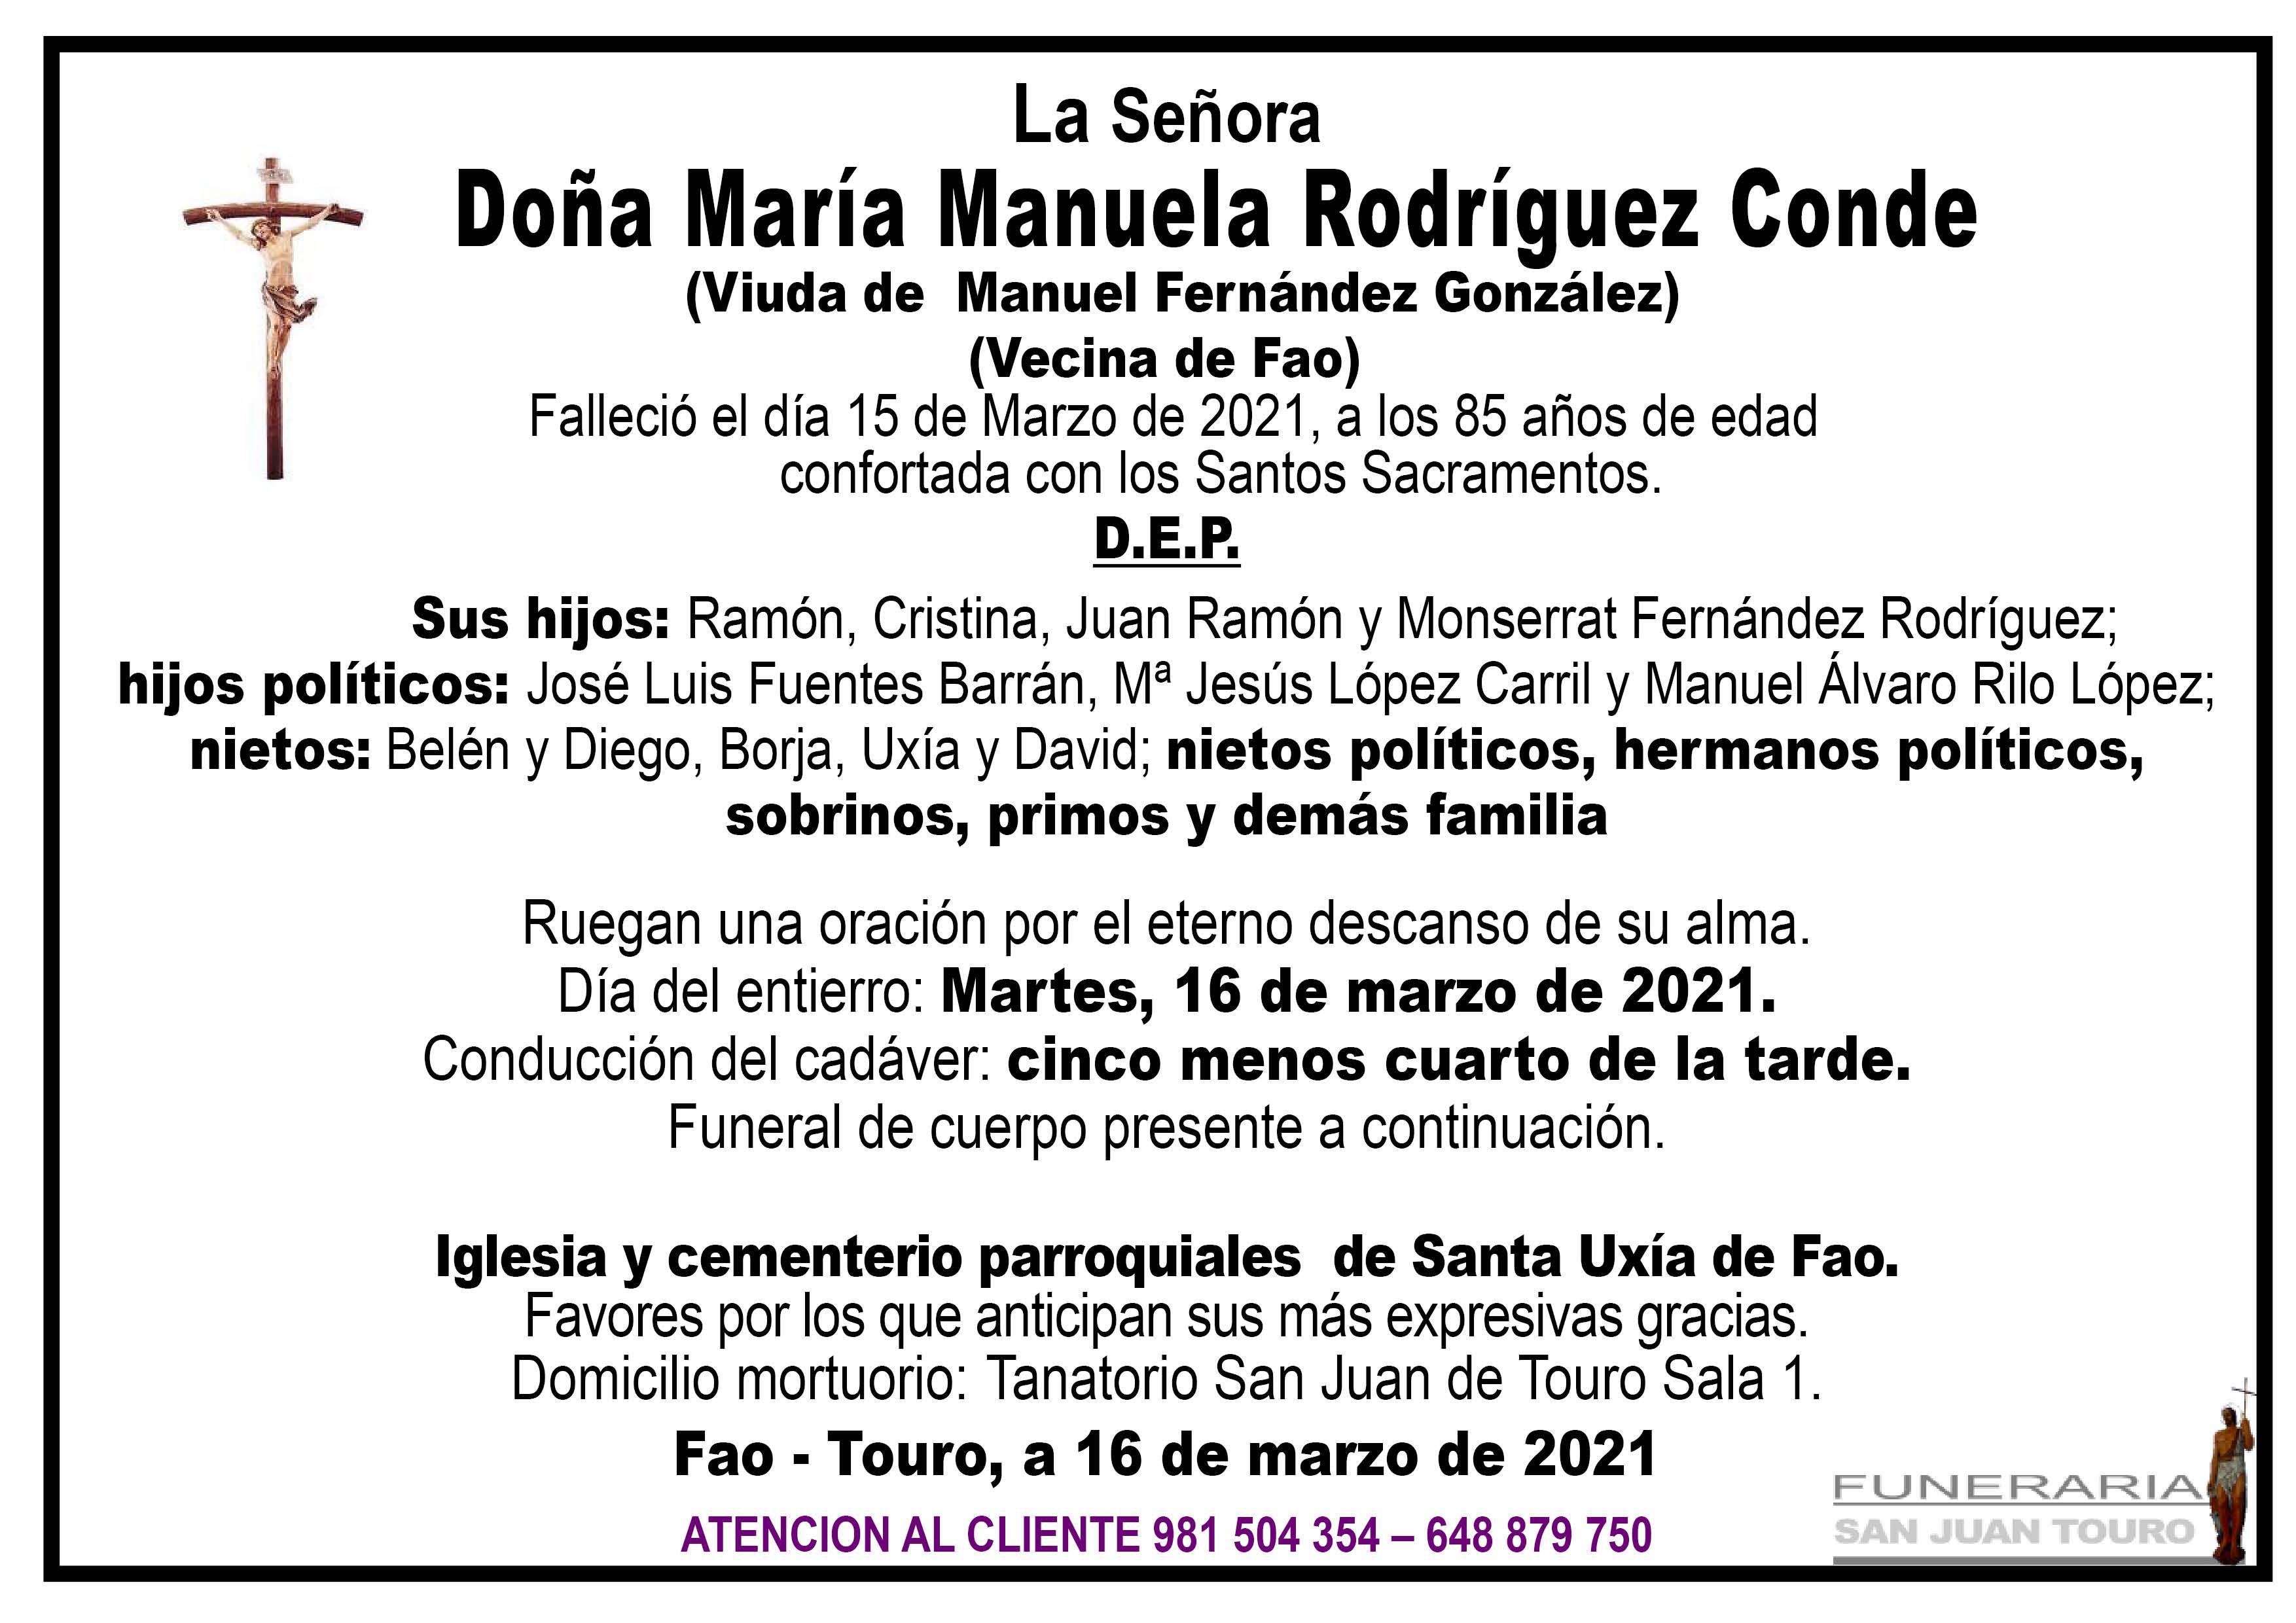 Esquela de SEPELIO DE DOÑA MARÍA MANUELA RODRÍGUEZ CONDE